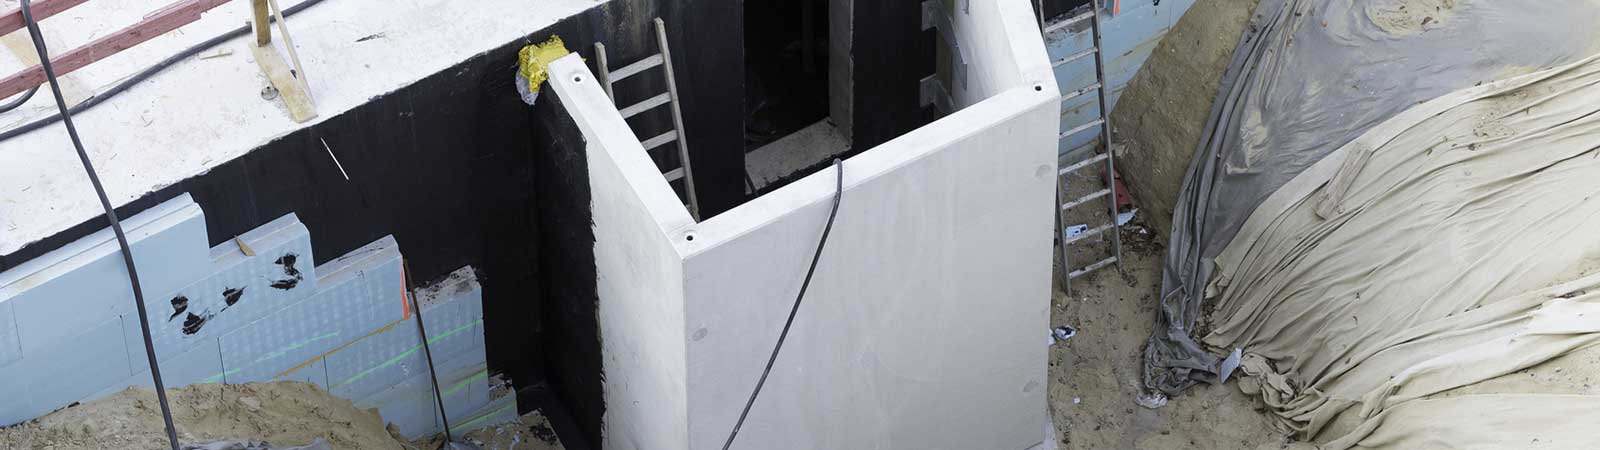 perimeterd mmung kellersanierung ausbau. Black Bedroom Furniture Sets. Home Design Ideas